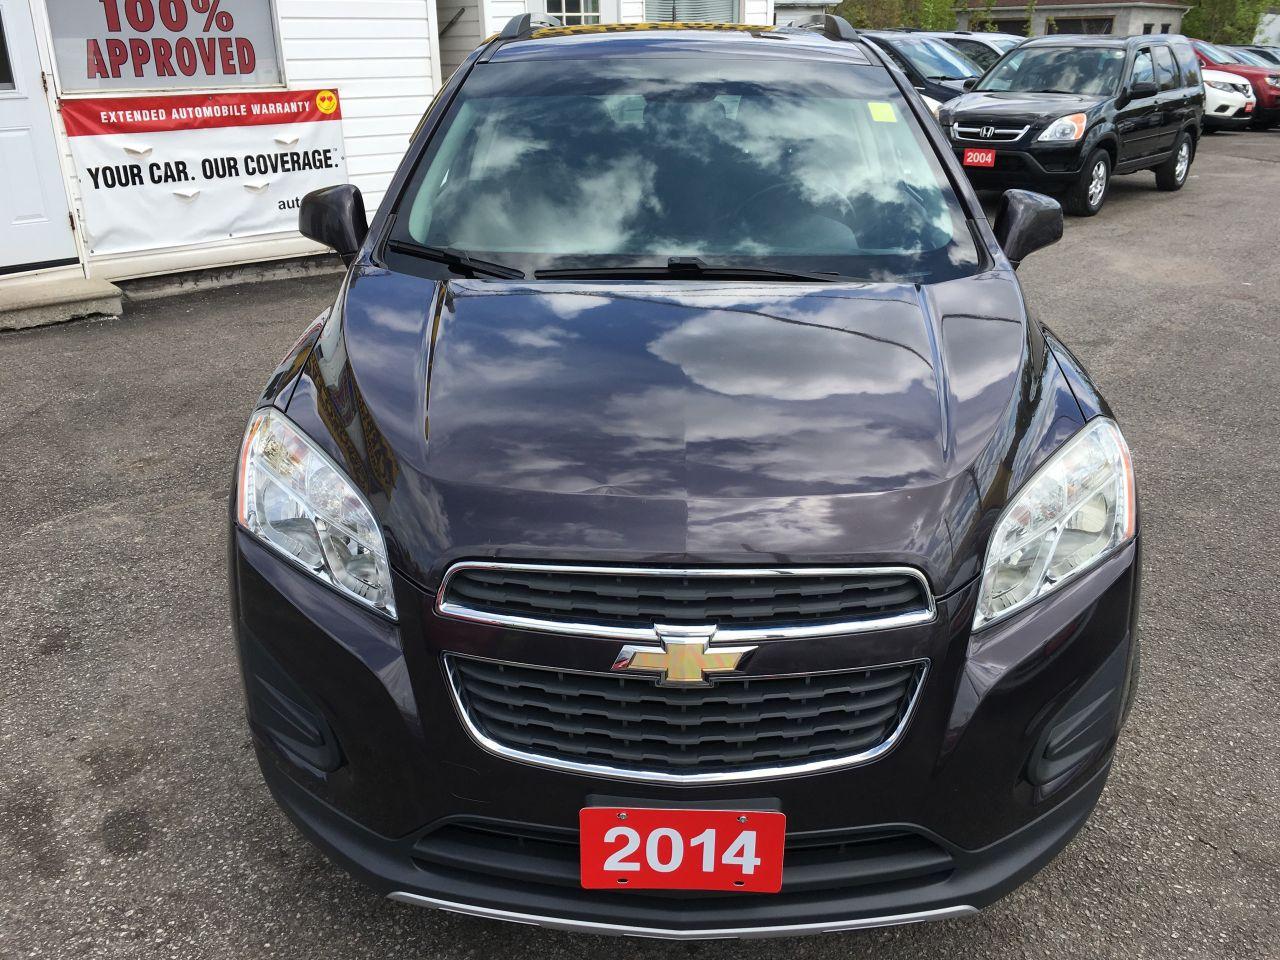 2014 Chevrolet Trax